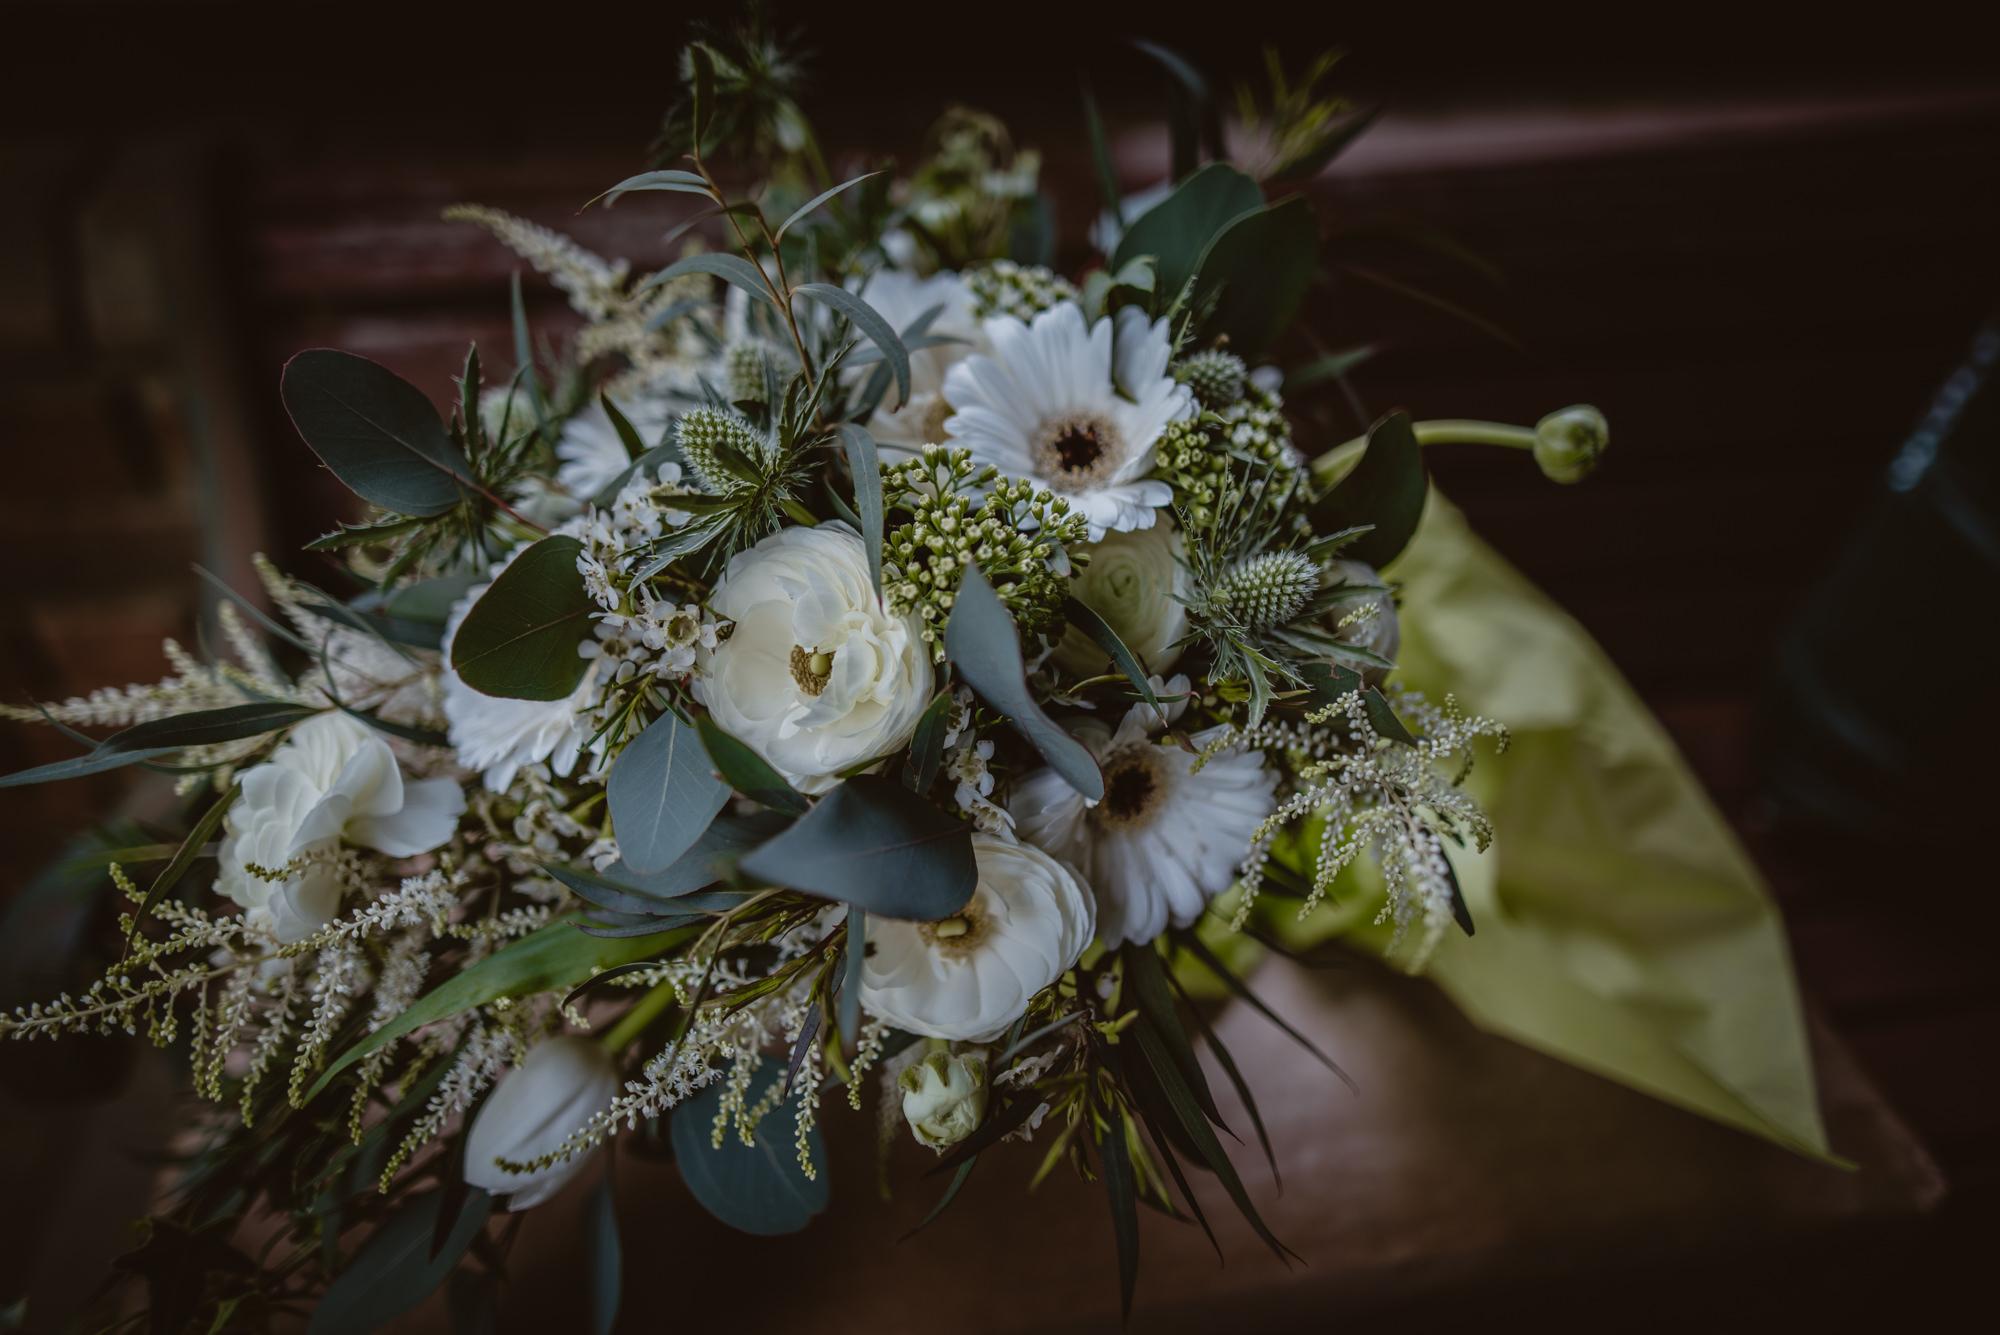 Jacqueline-Gareth-Wedding-Westmead-Events-Surrey-Manu-Mendoza-Wedding-Photography-159.jpg